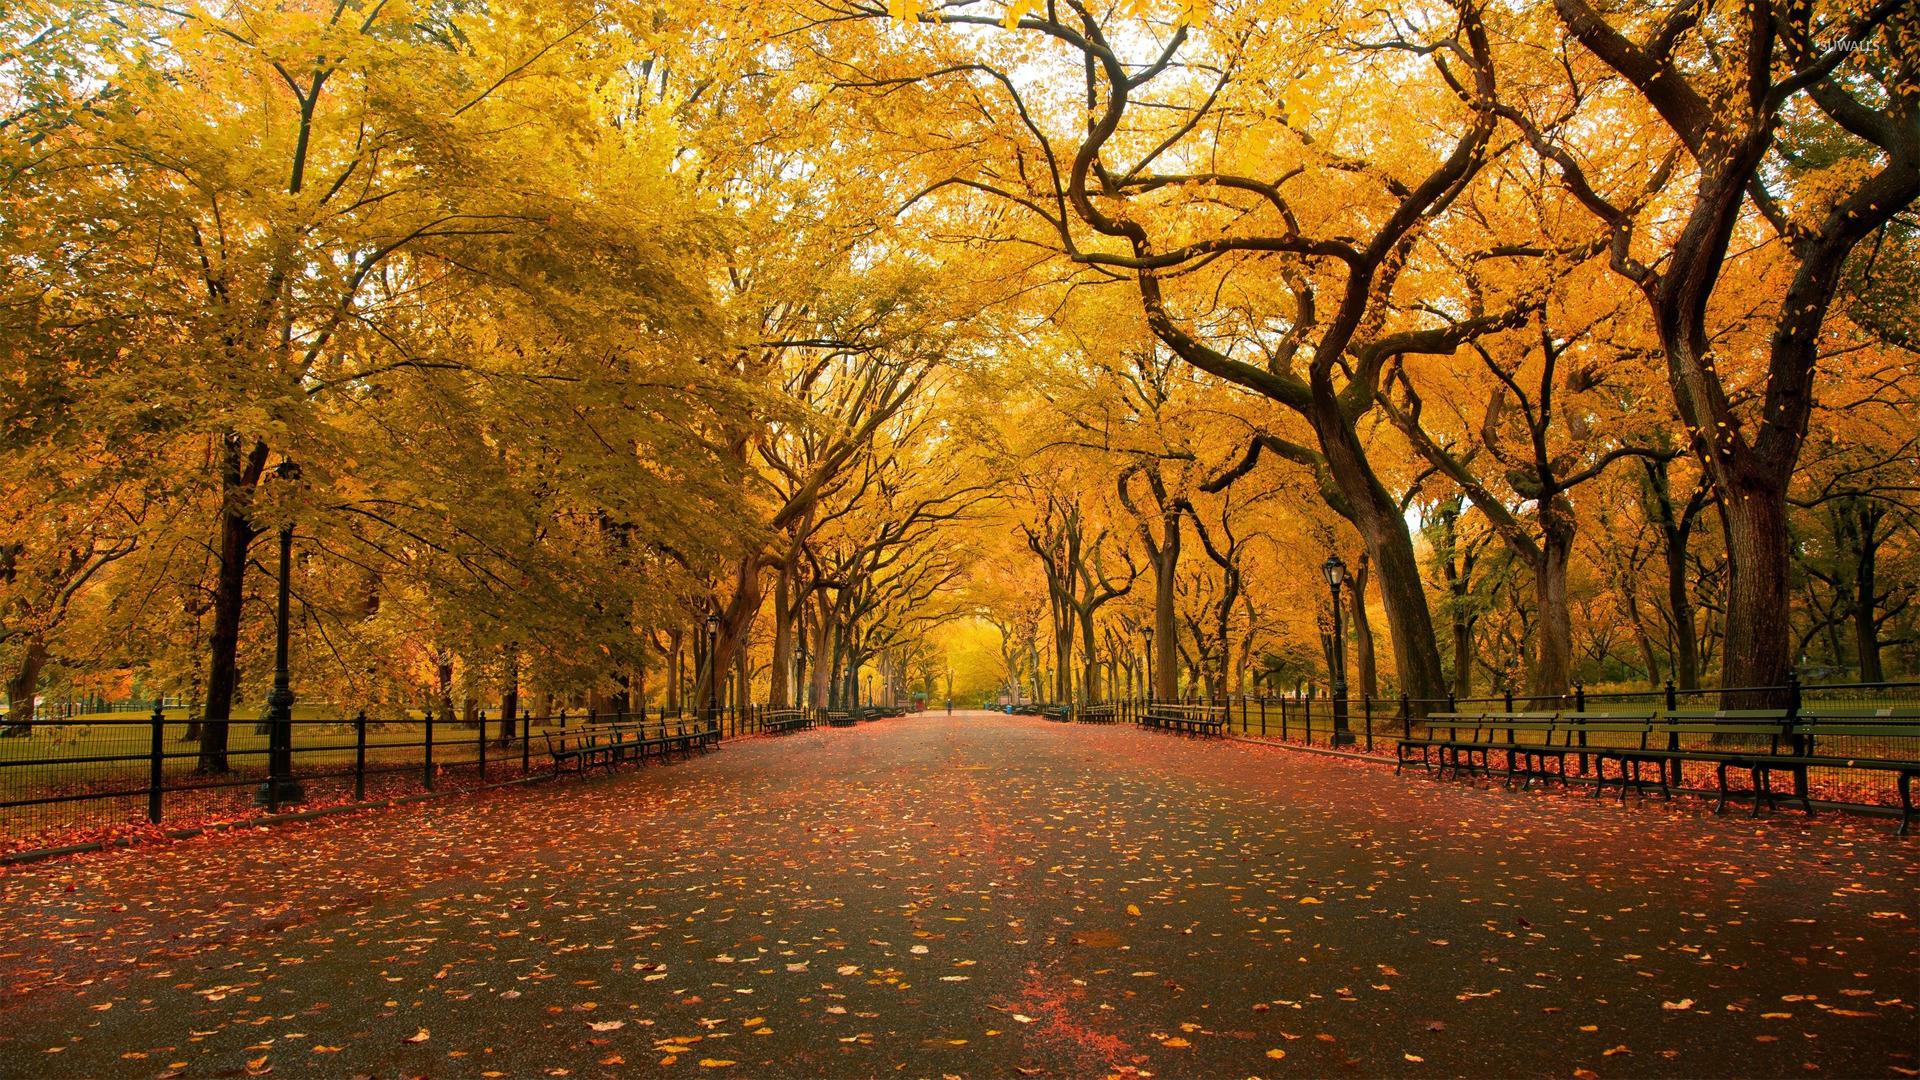 autumn park wallpaper 1920x1080 - photo #8